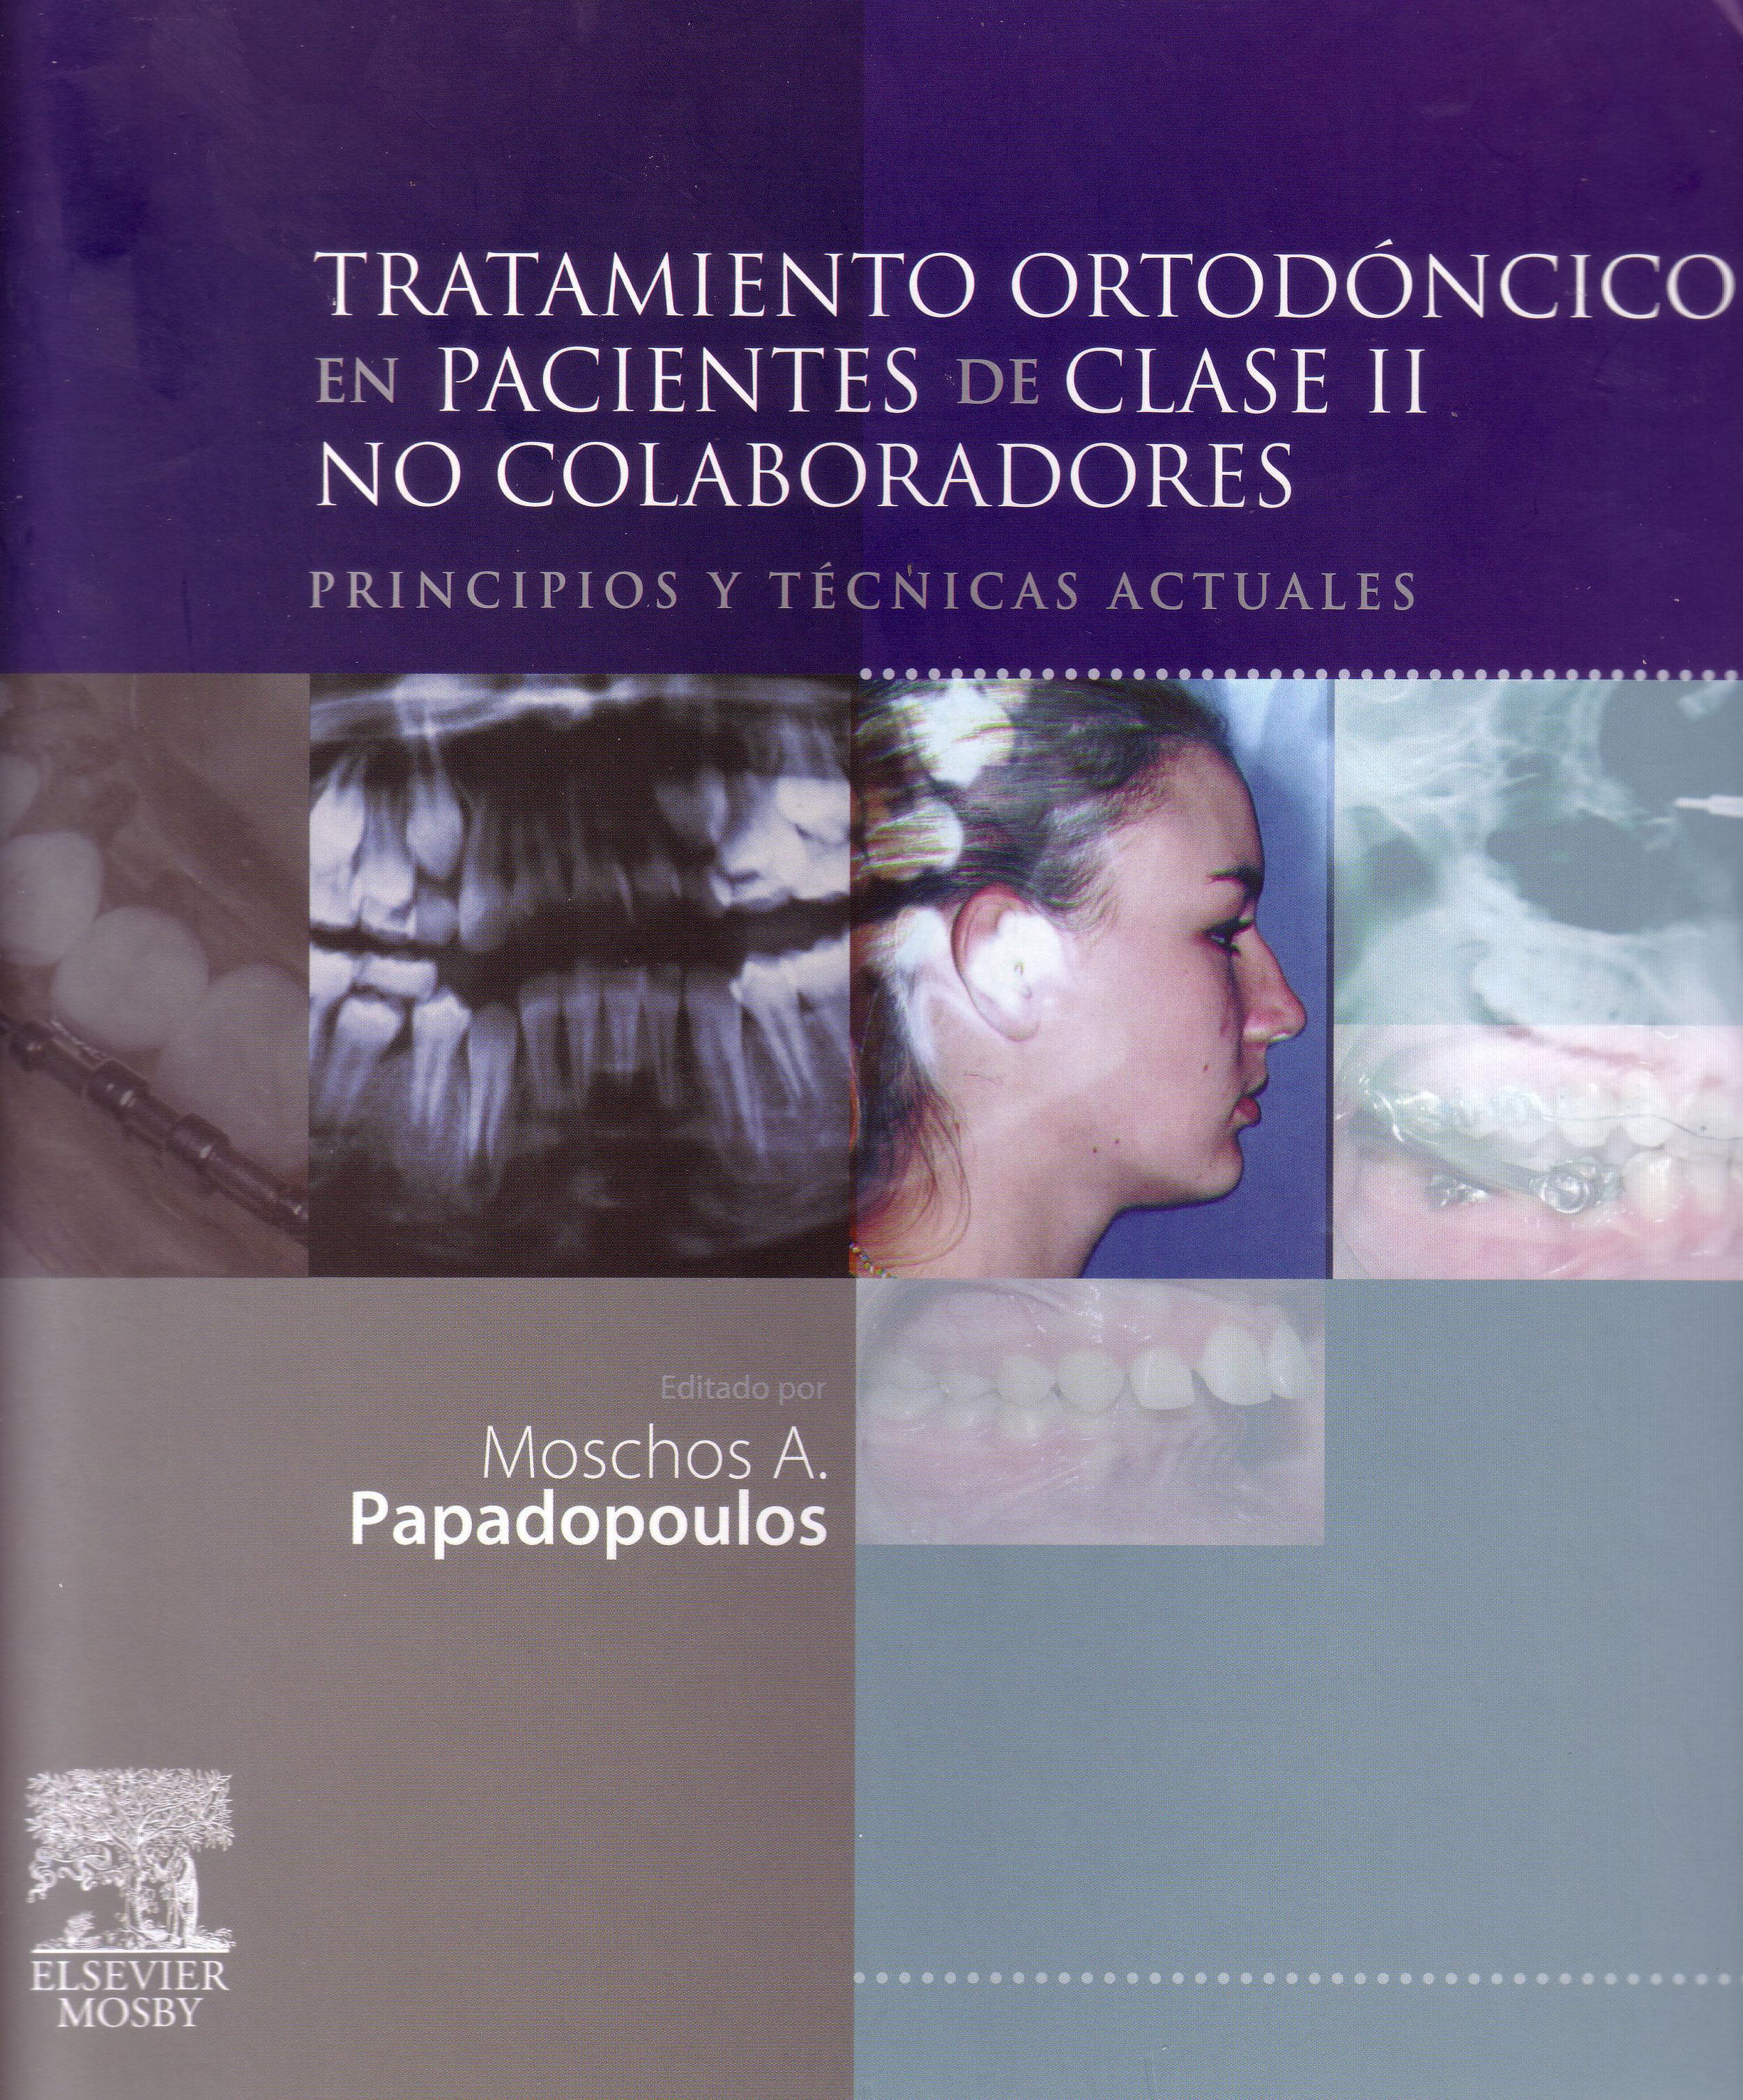 book_spanish.jpg